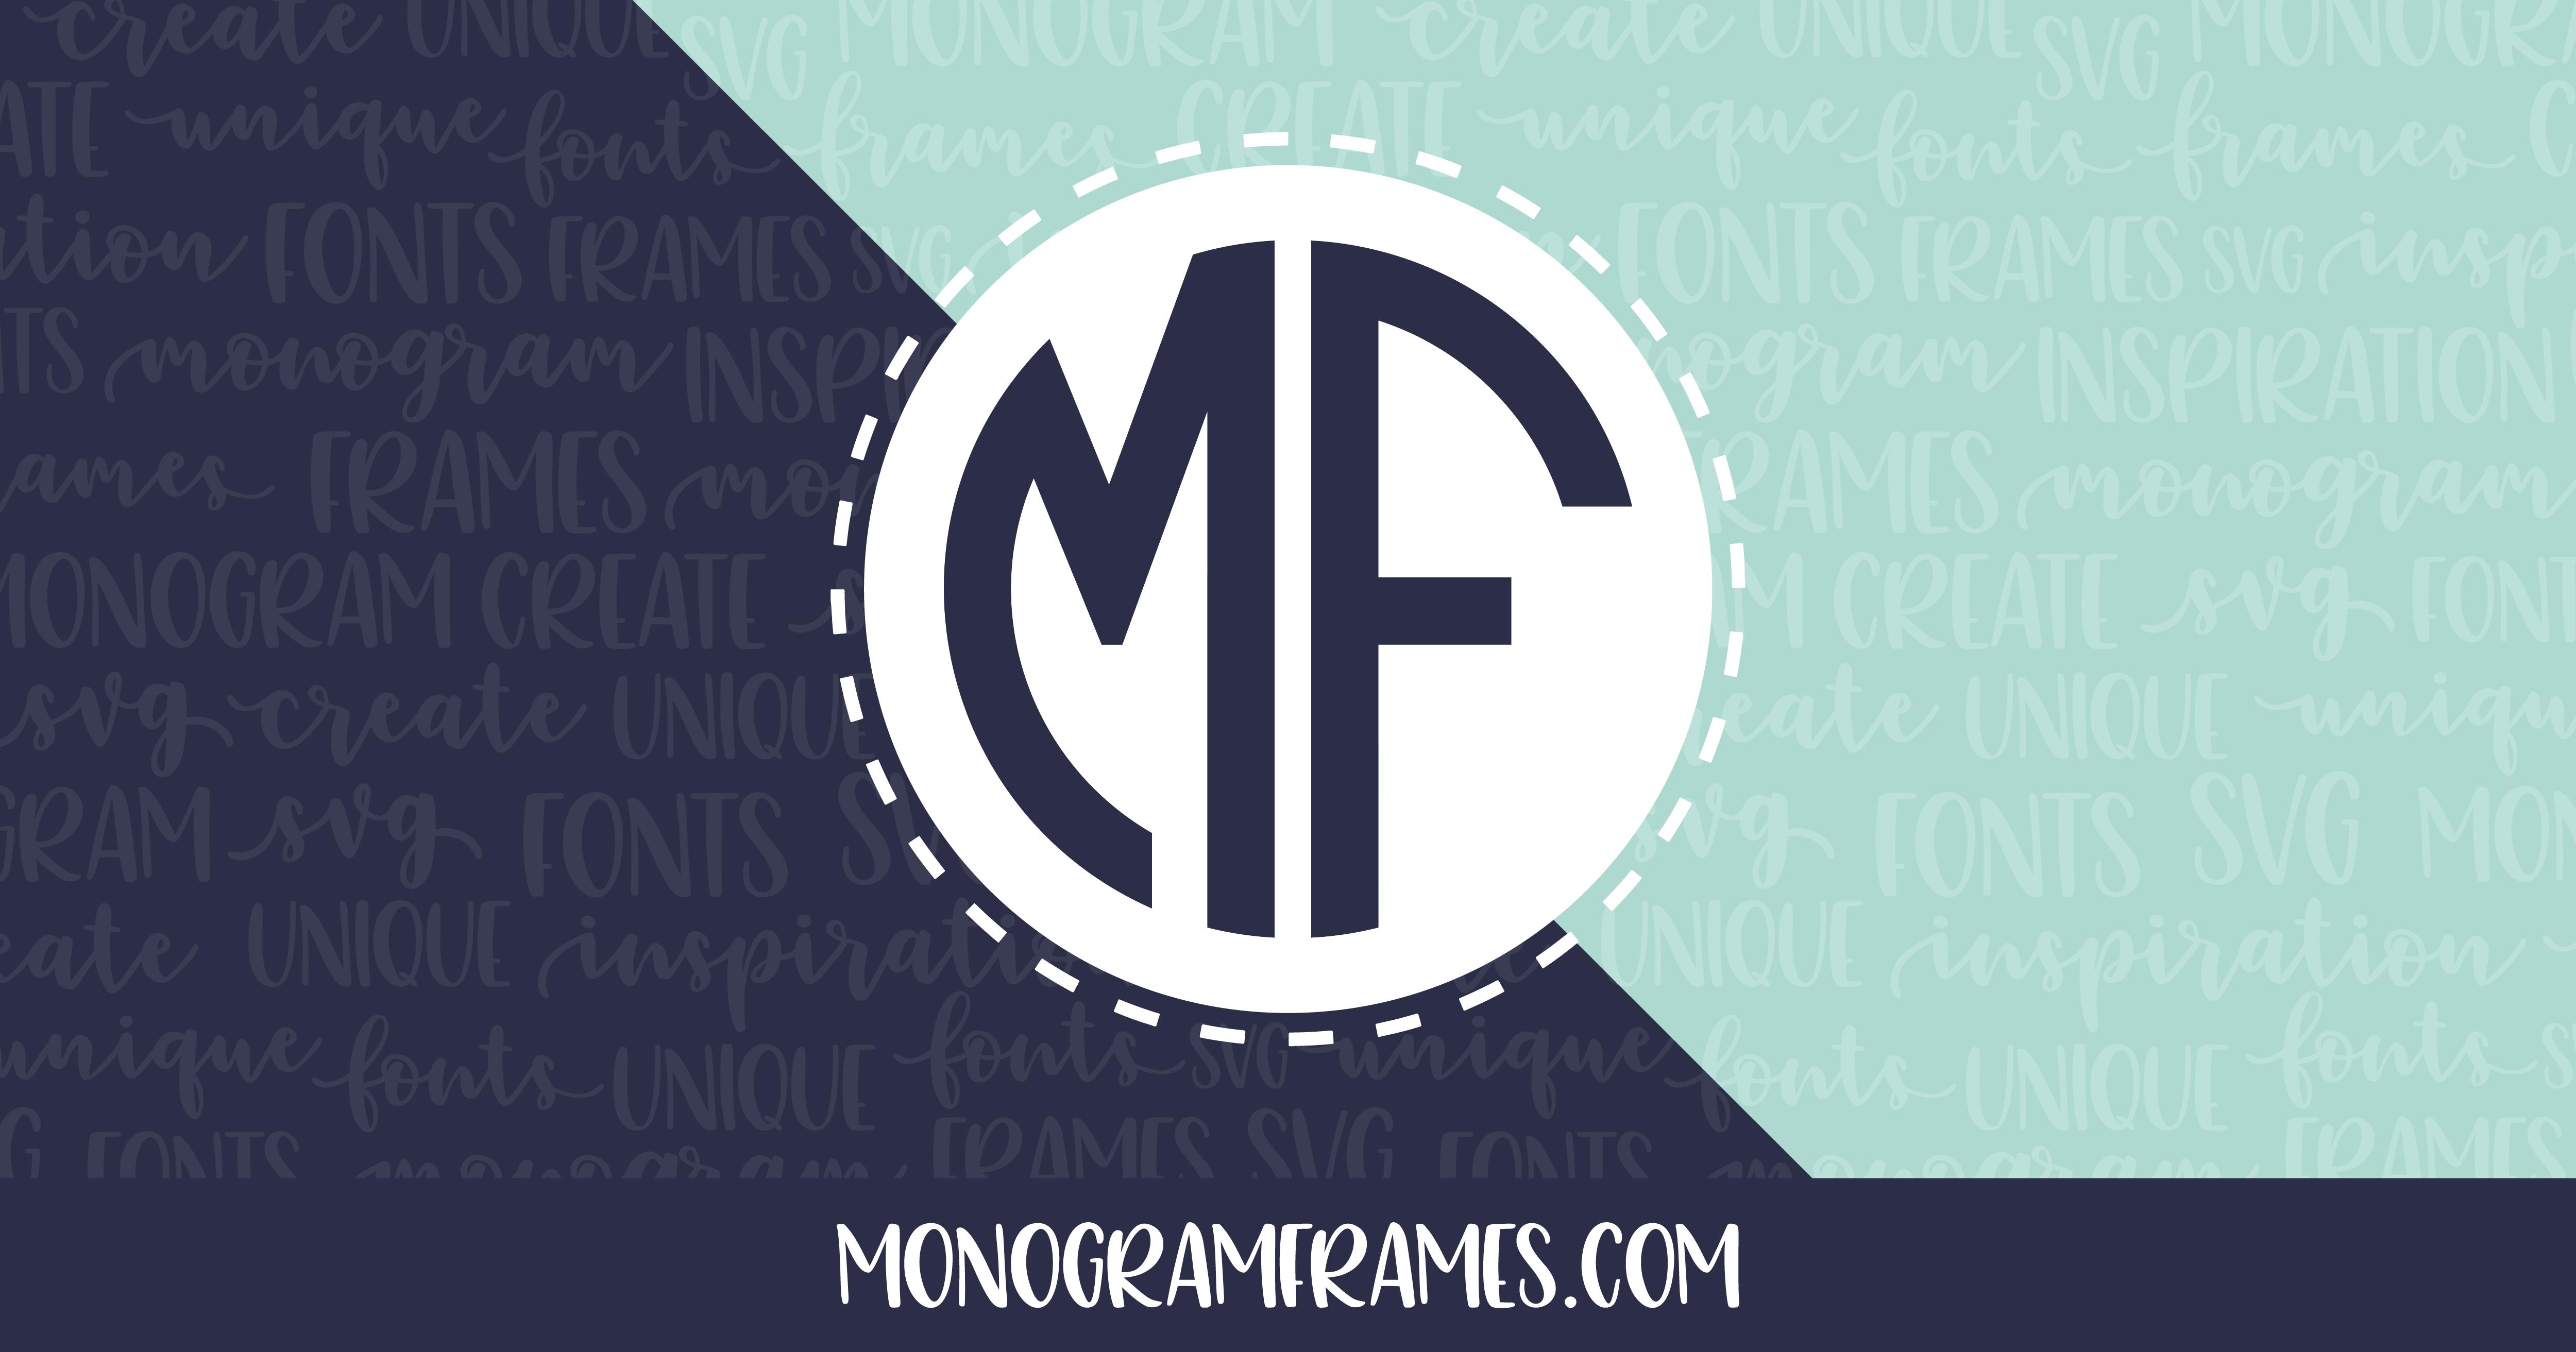 monogram frames create your